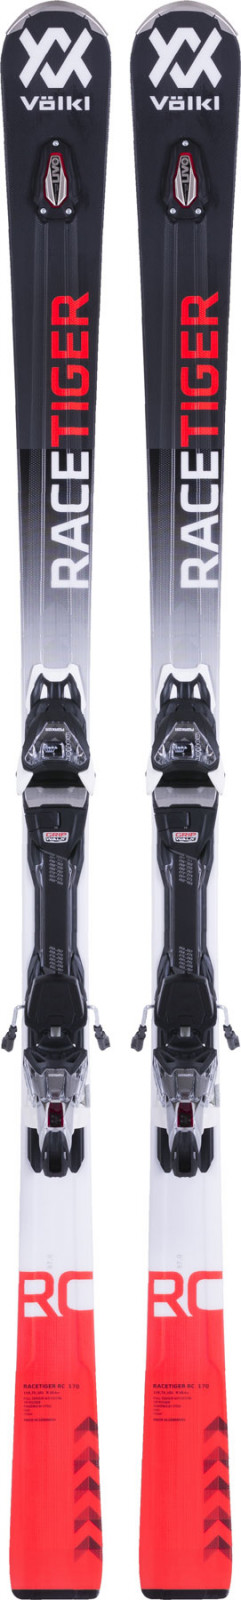 Völkl Racetiger RC Black + vMotion 10 GW